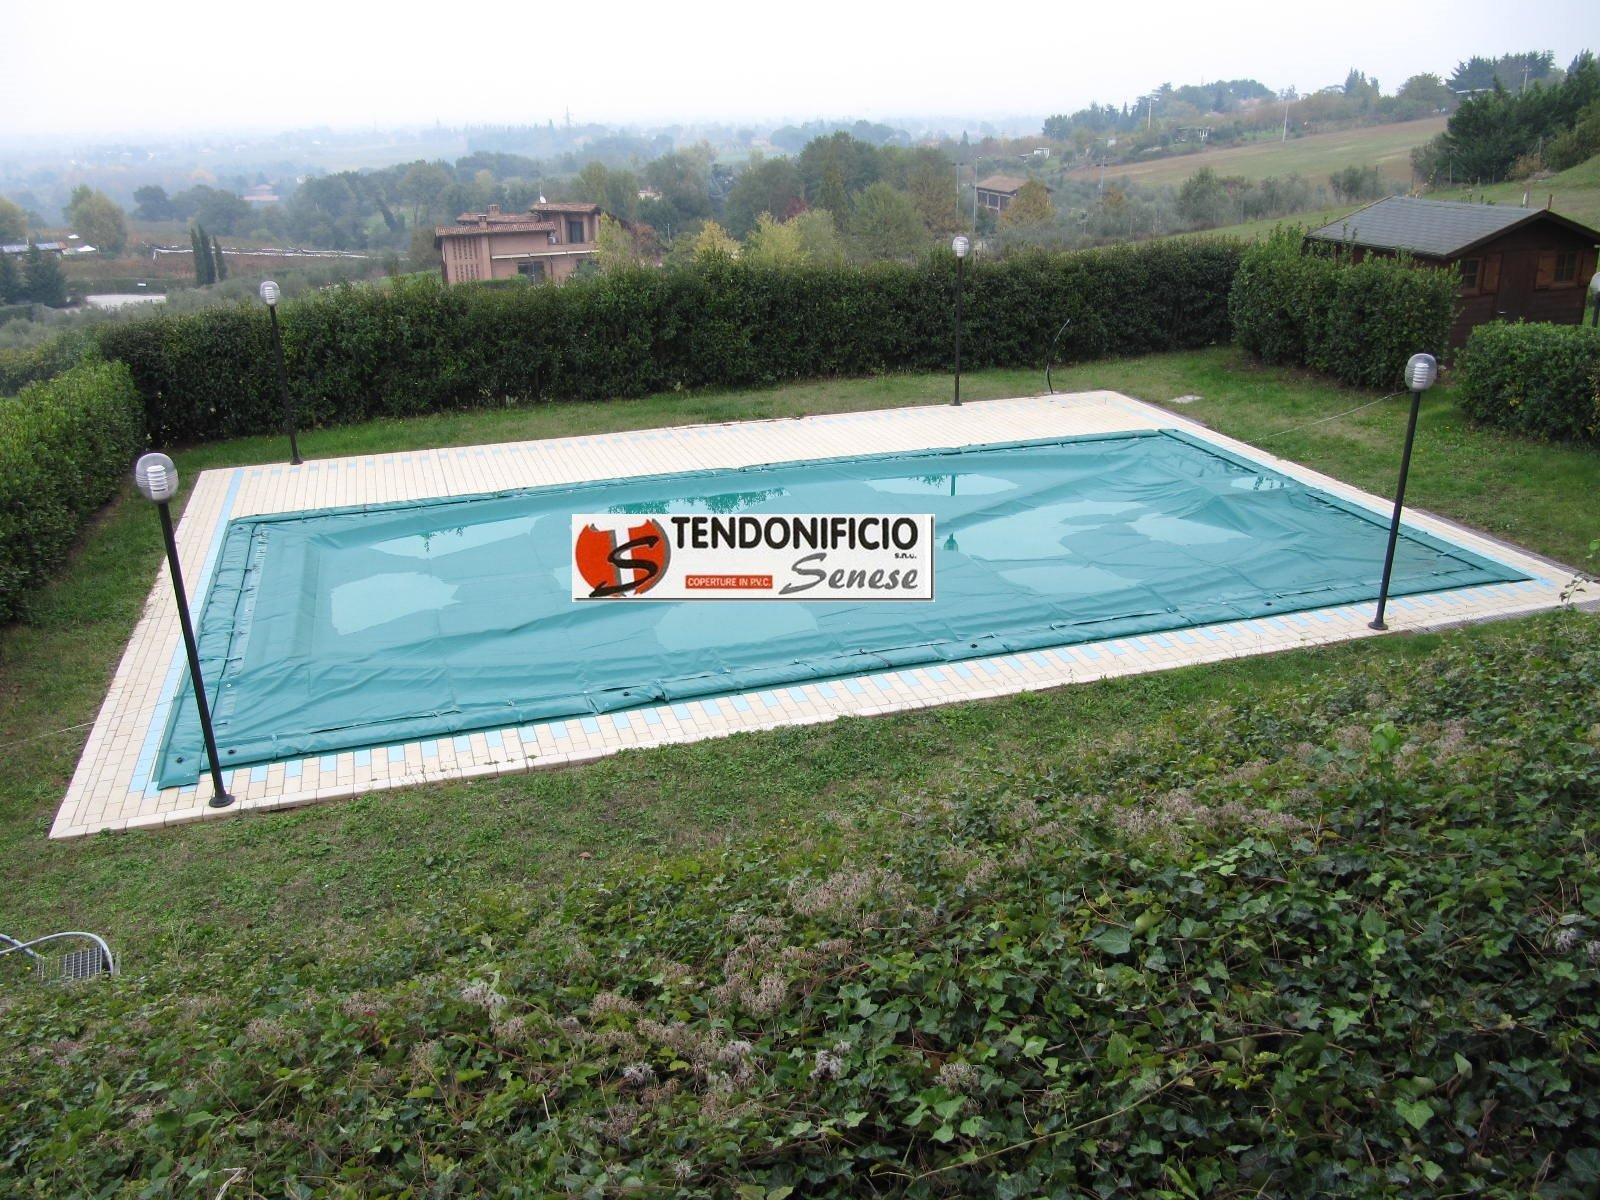 Teli di copertura per piscina monteroni d 39 arbia tendonificio senese - Saldatura telo pvc piscina ...